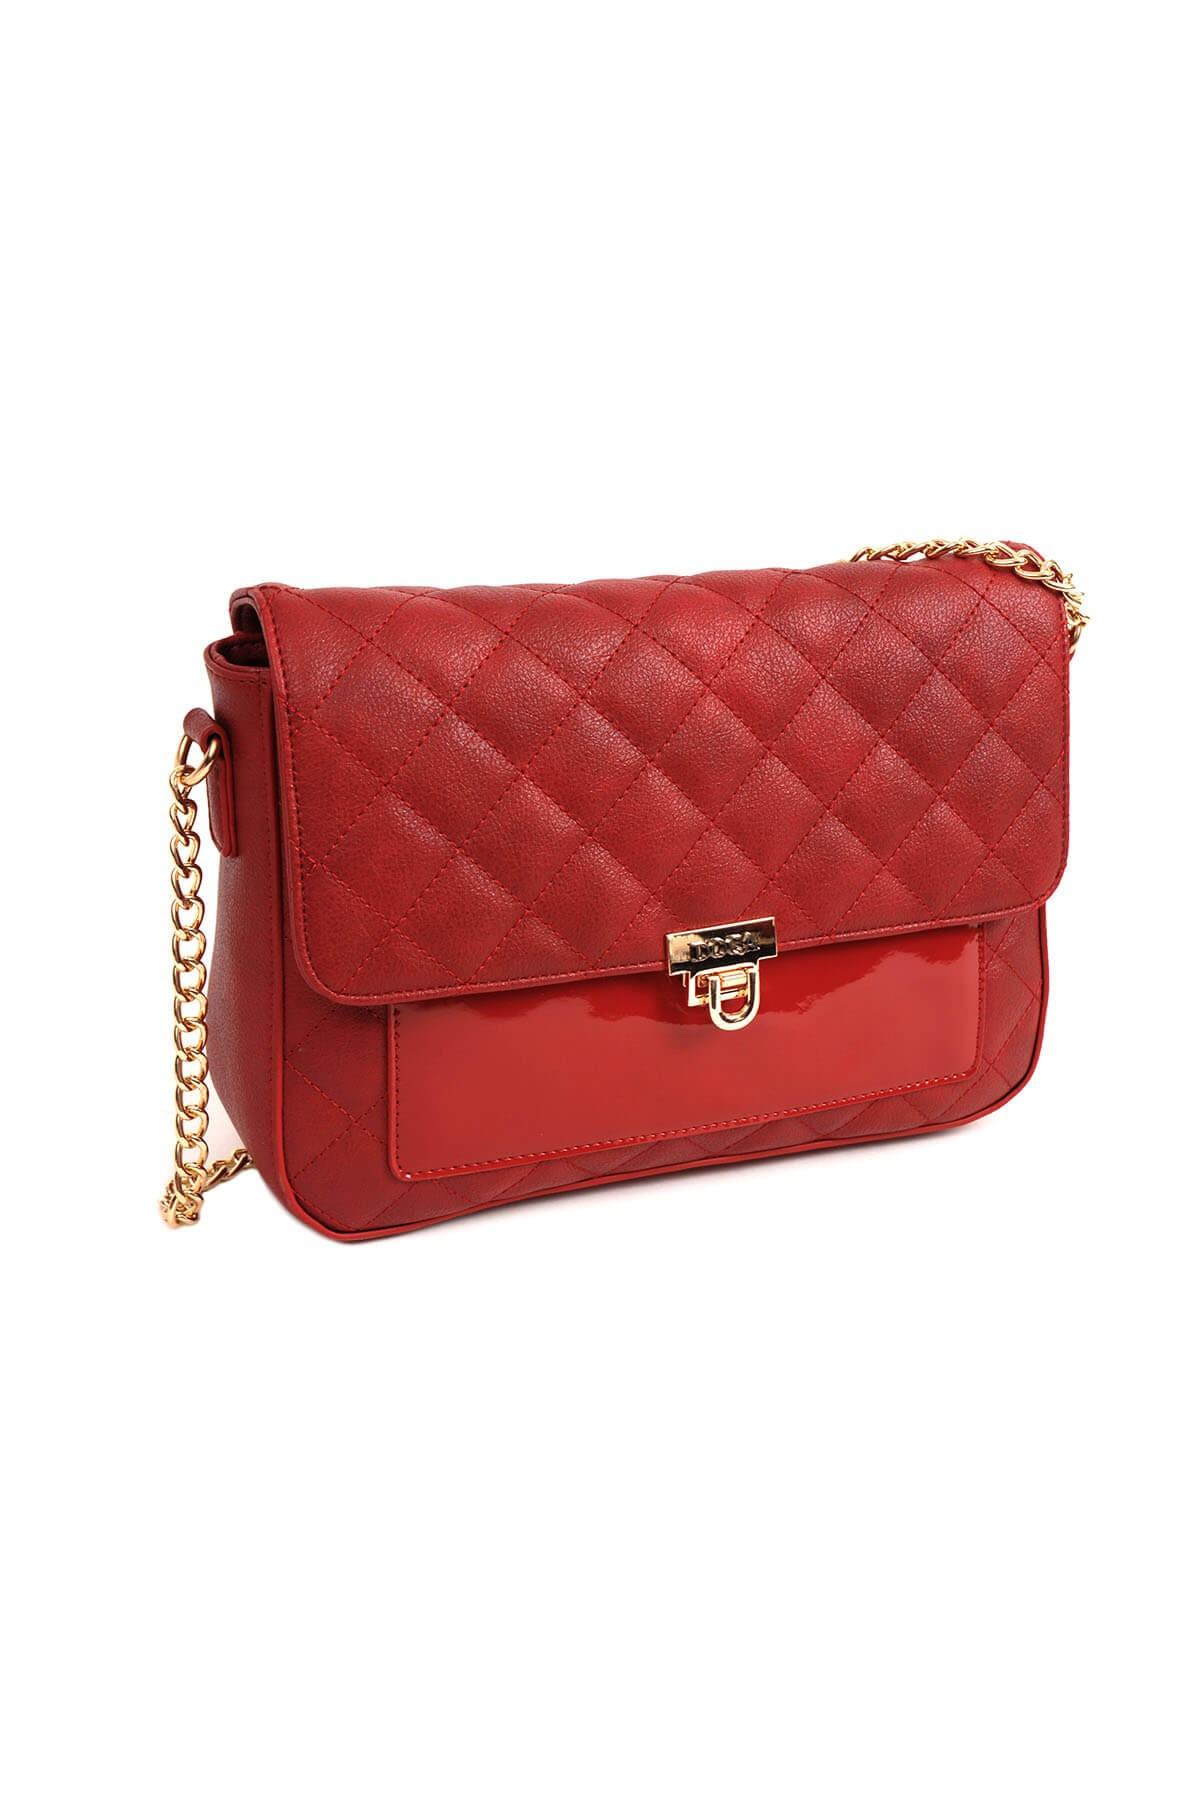 Dámska crossbody kabelka Doca 14158 - červená